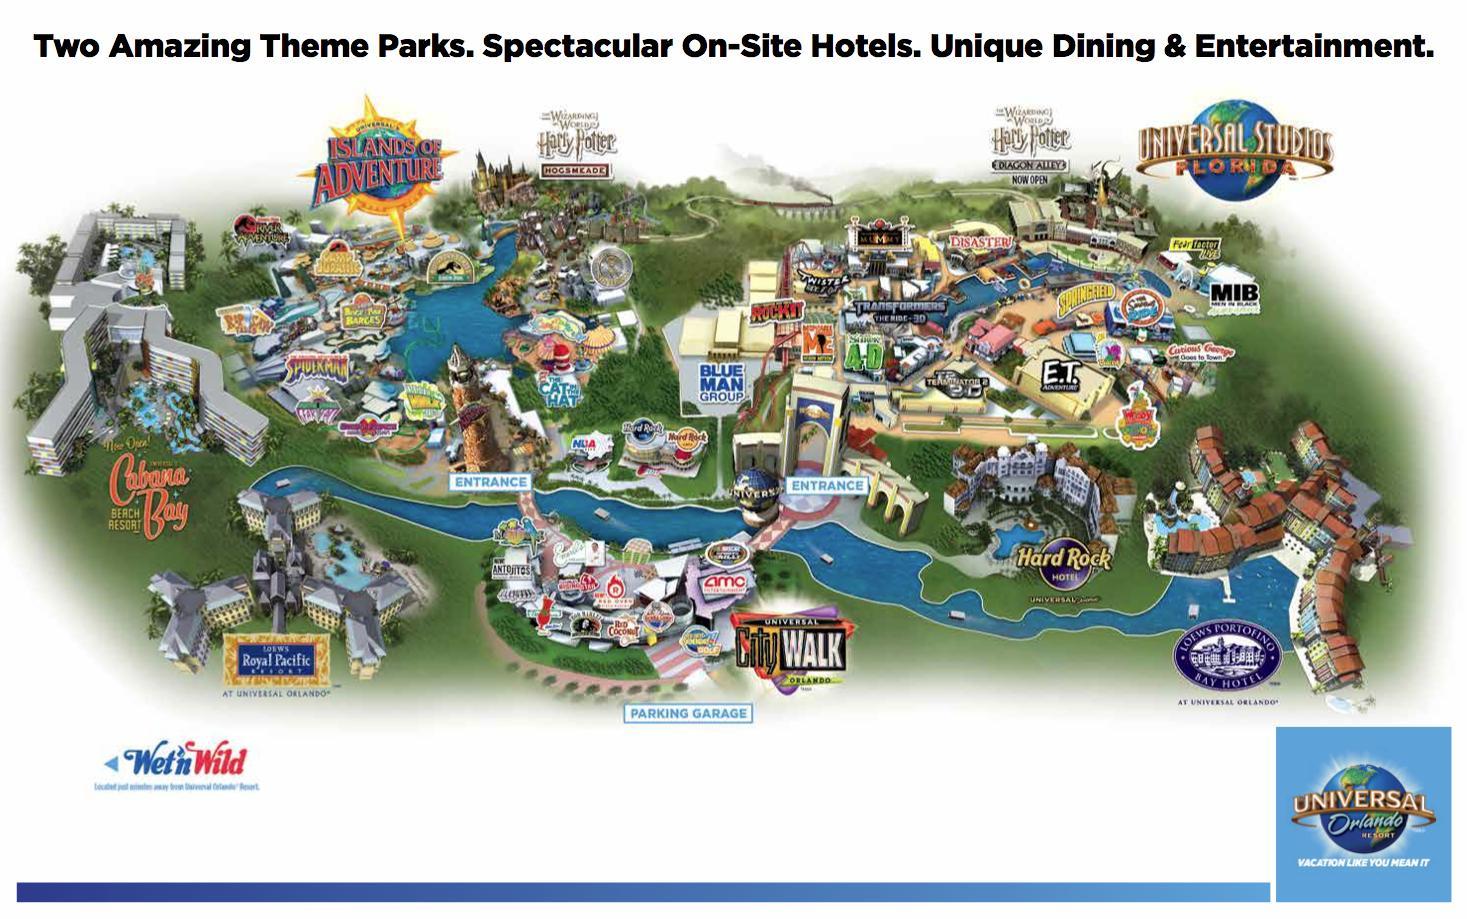 Universal Orlando Mapart Exhibitionuniversal Studios Park - States - Universal Studios Florida Park Map